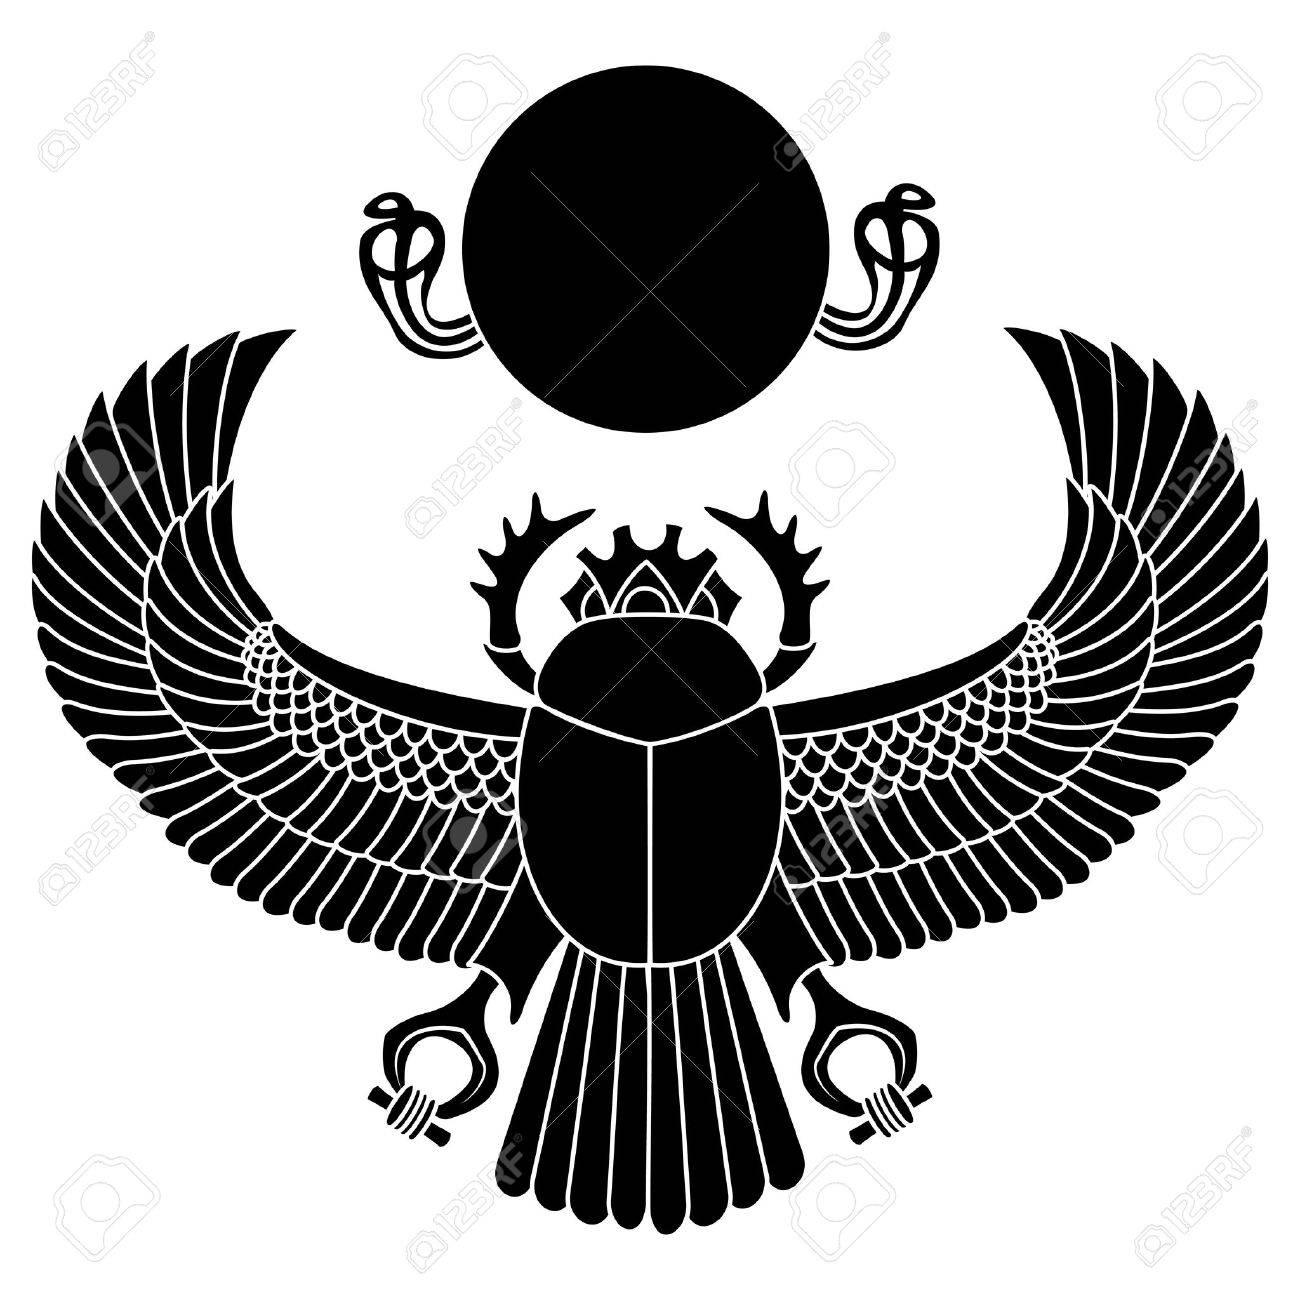 silhouette logo scarab. vector illustration clip art Stock Vector - 25999891